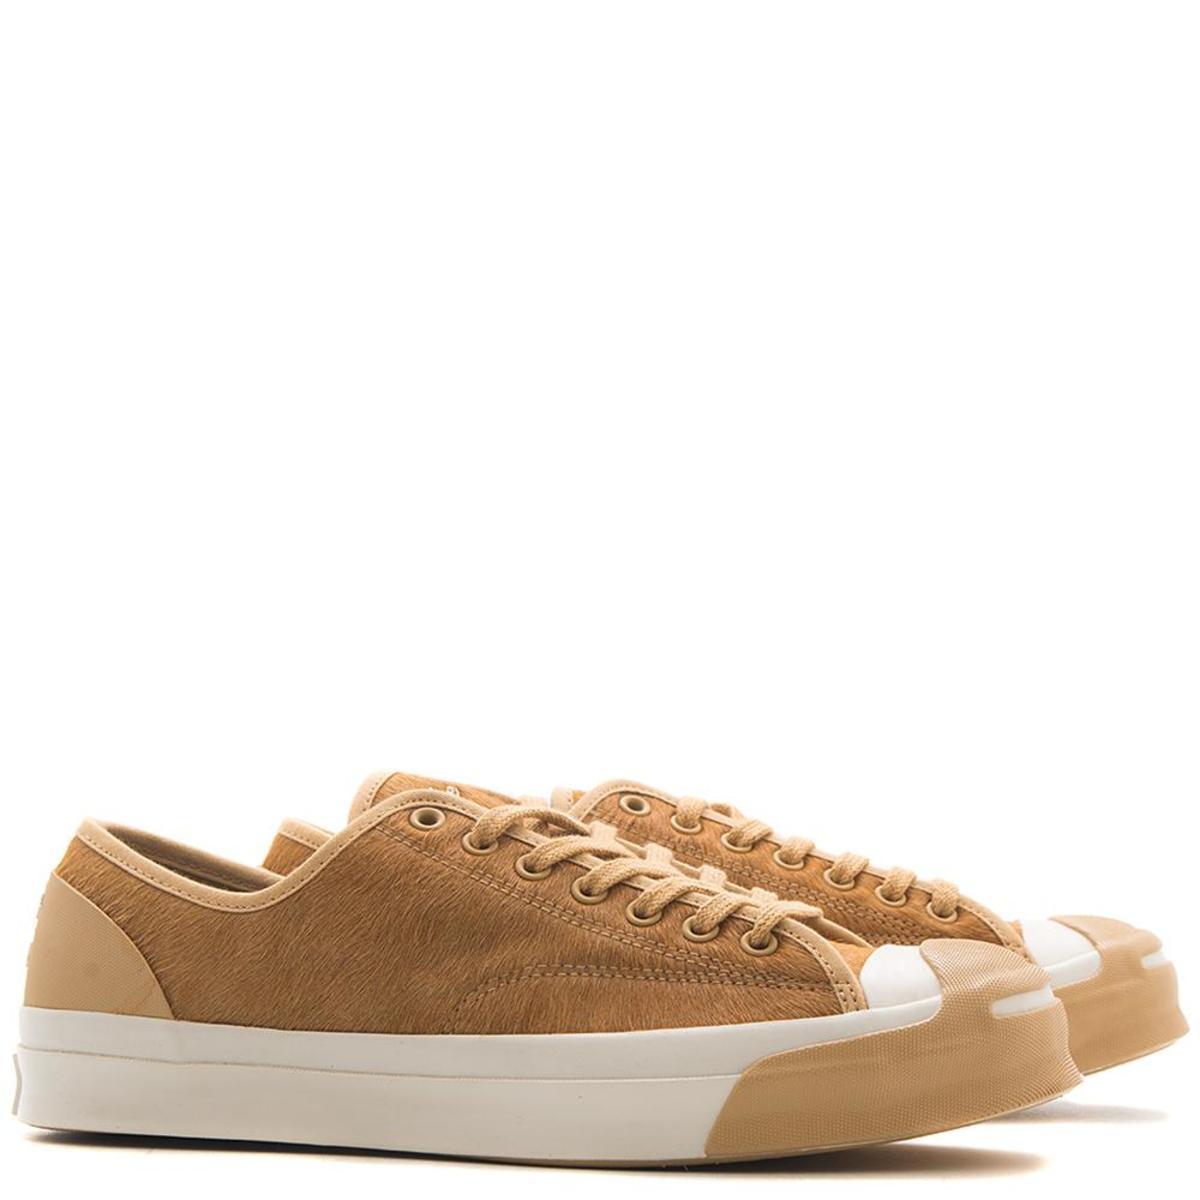 Converse Gold Star x Born x Raised Jack Purcell Modern Sneaker - Camel 2f65331f8d